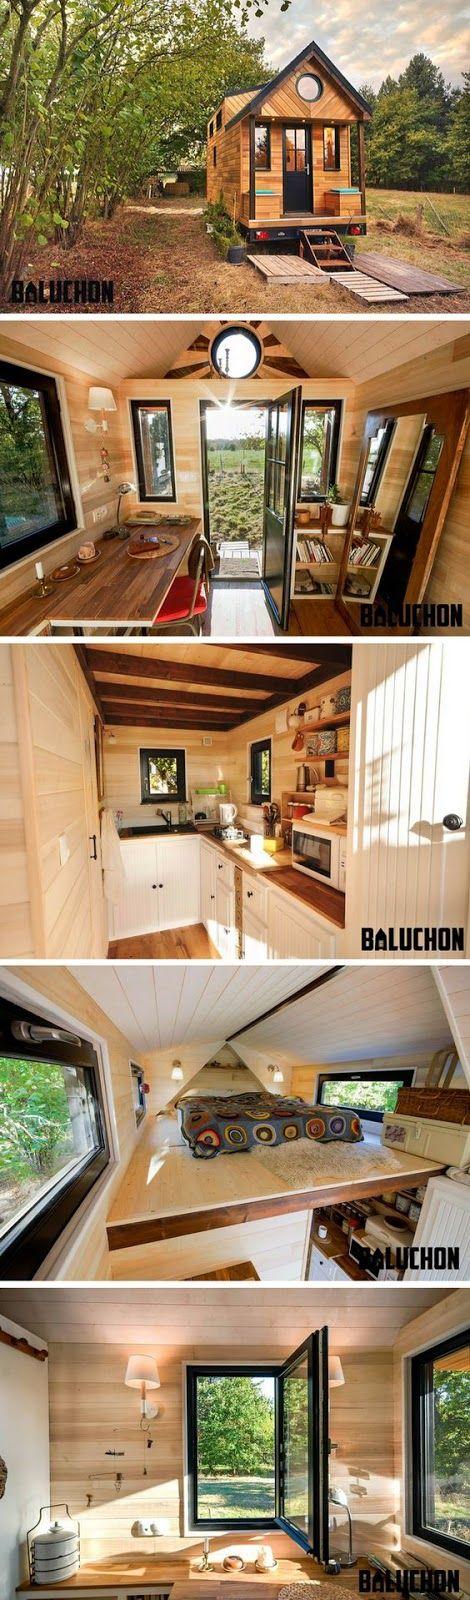 mytinyhousedirectory: The Avonlea By Baluchon